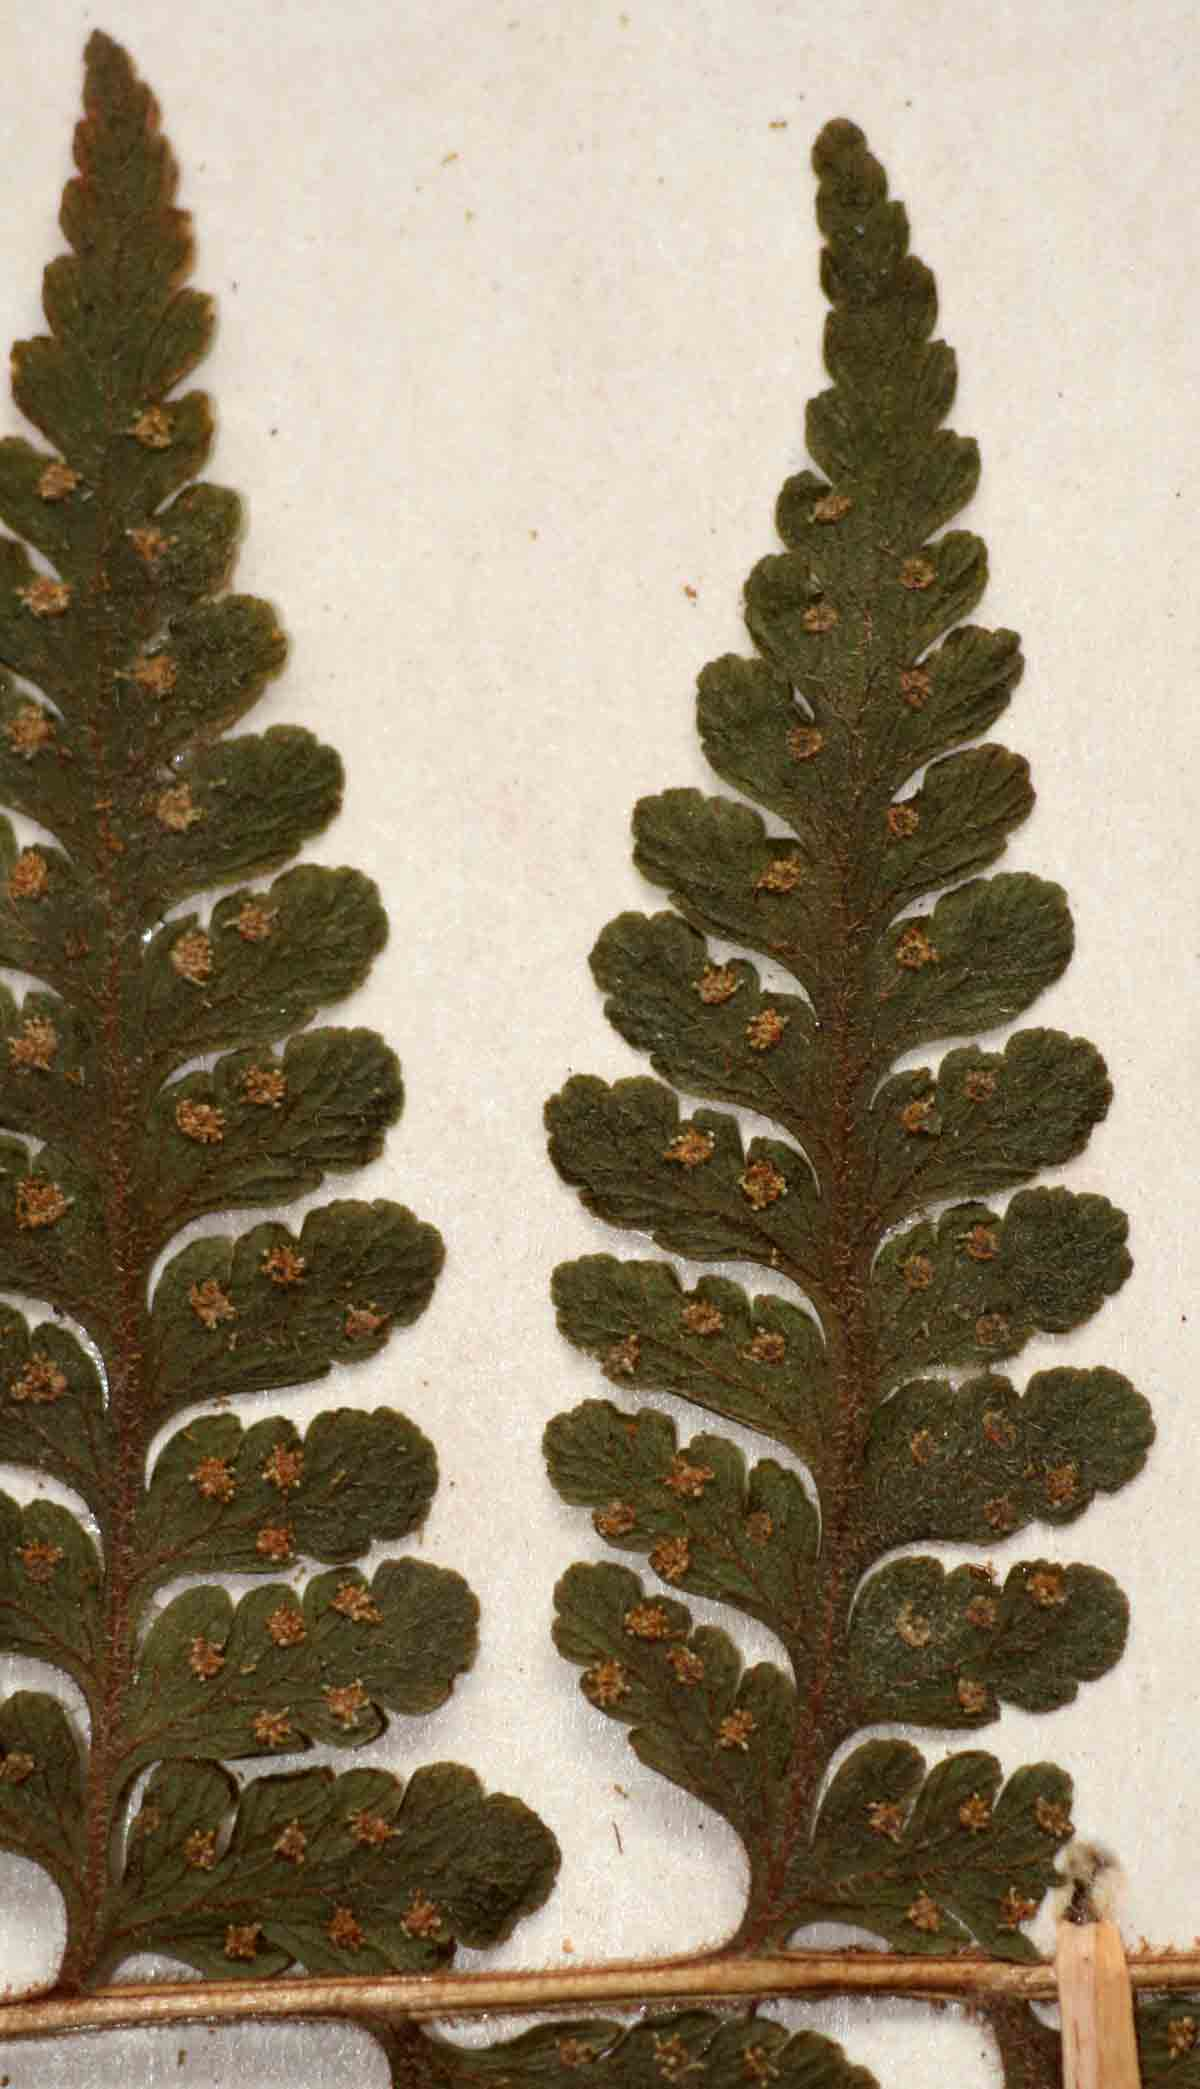 Microlepia speluncae